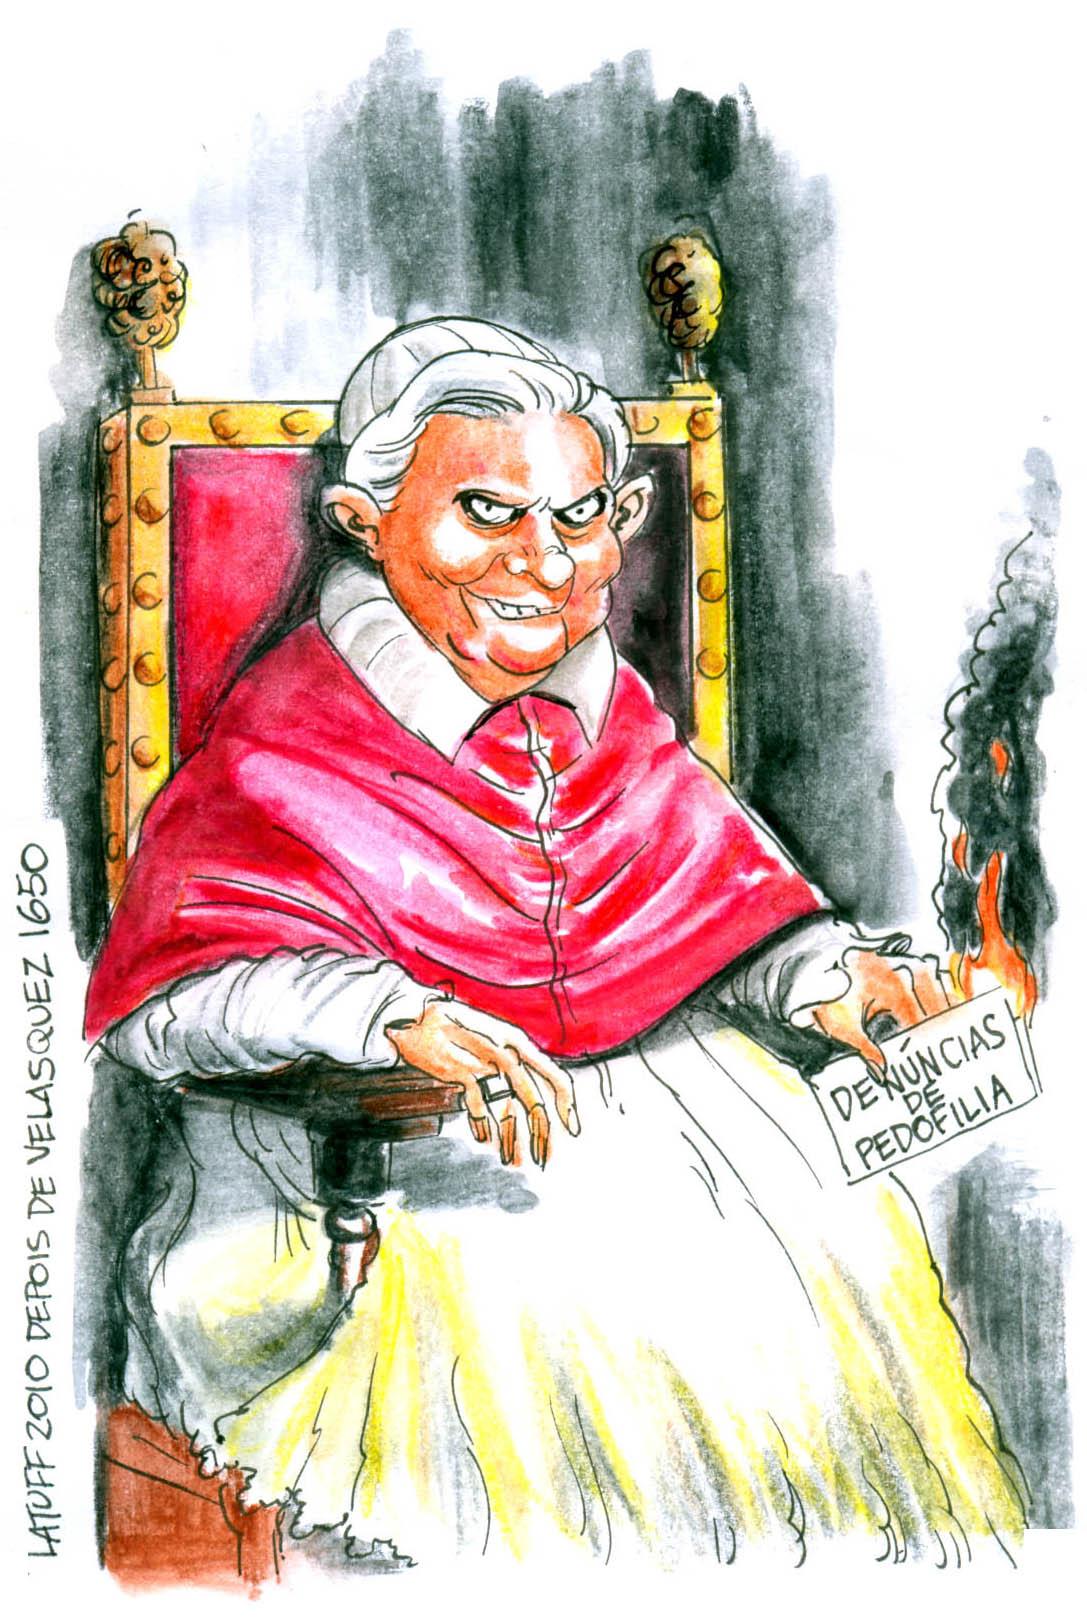 Pope Benedict XVI portrait by Latuff2 on DeviantArt.